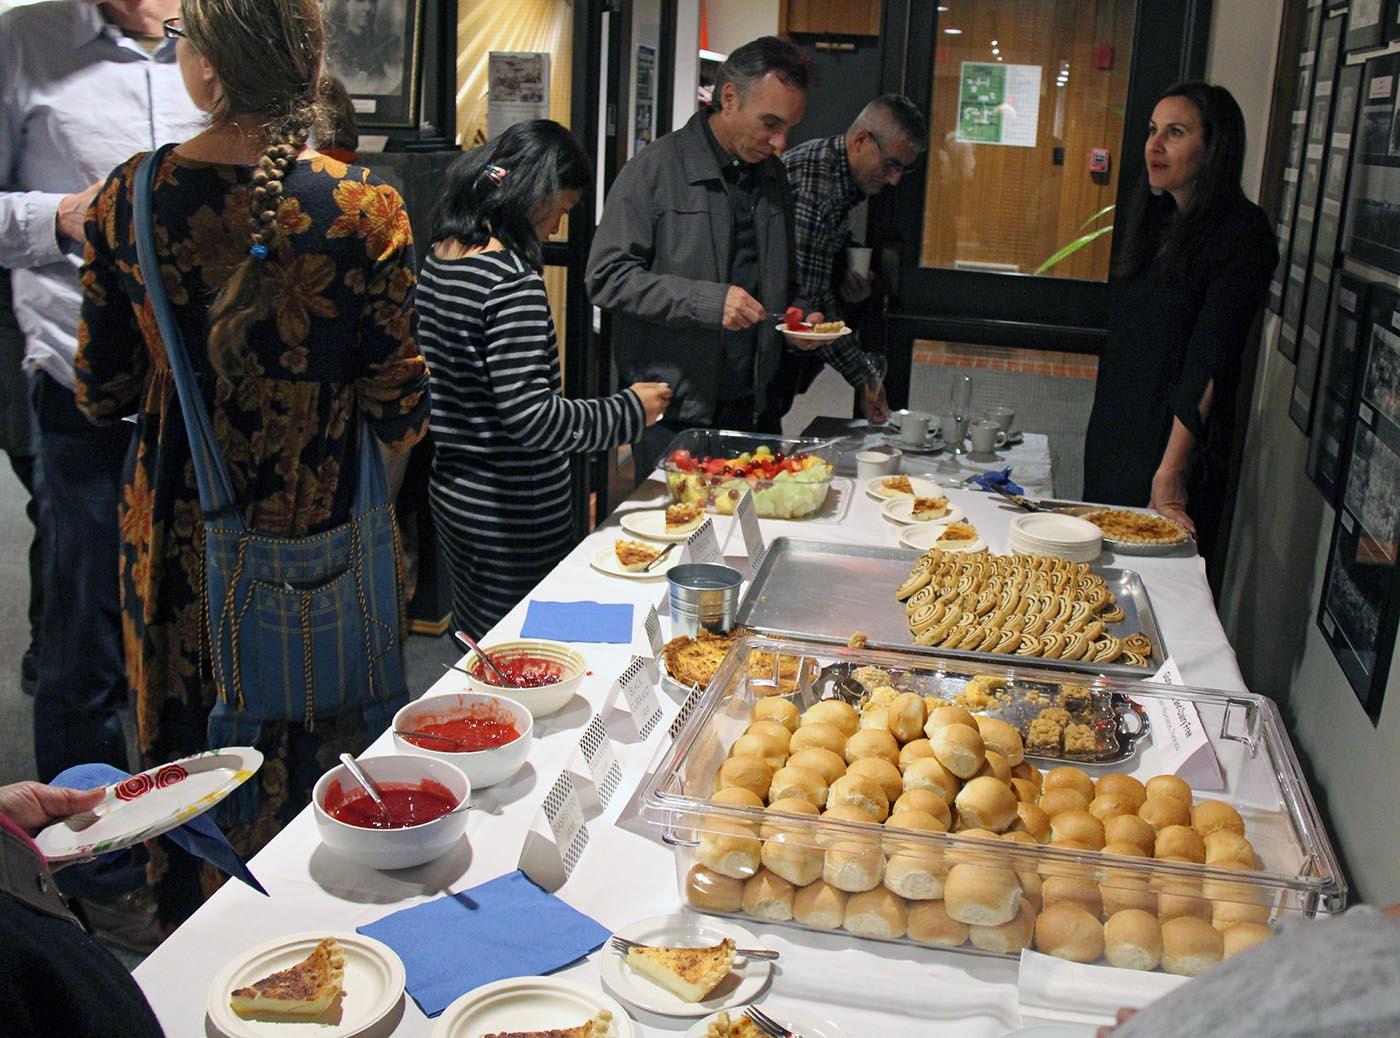 Reception food from Netley Community